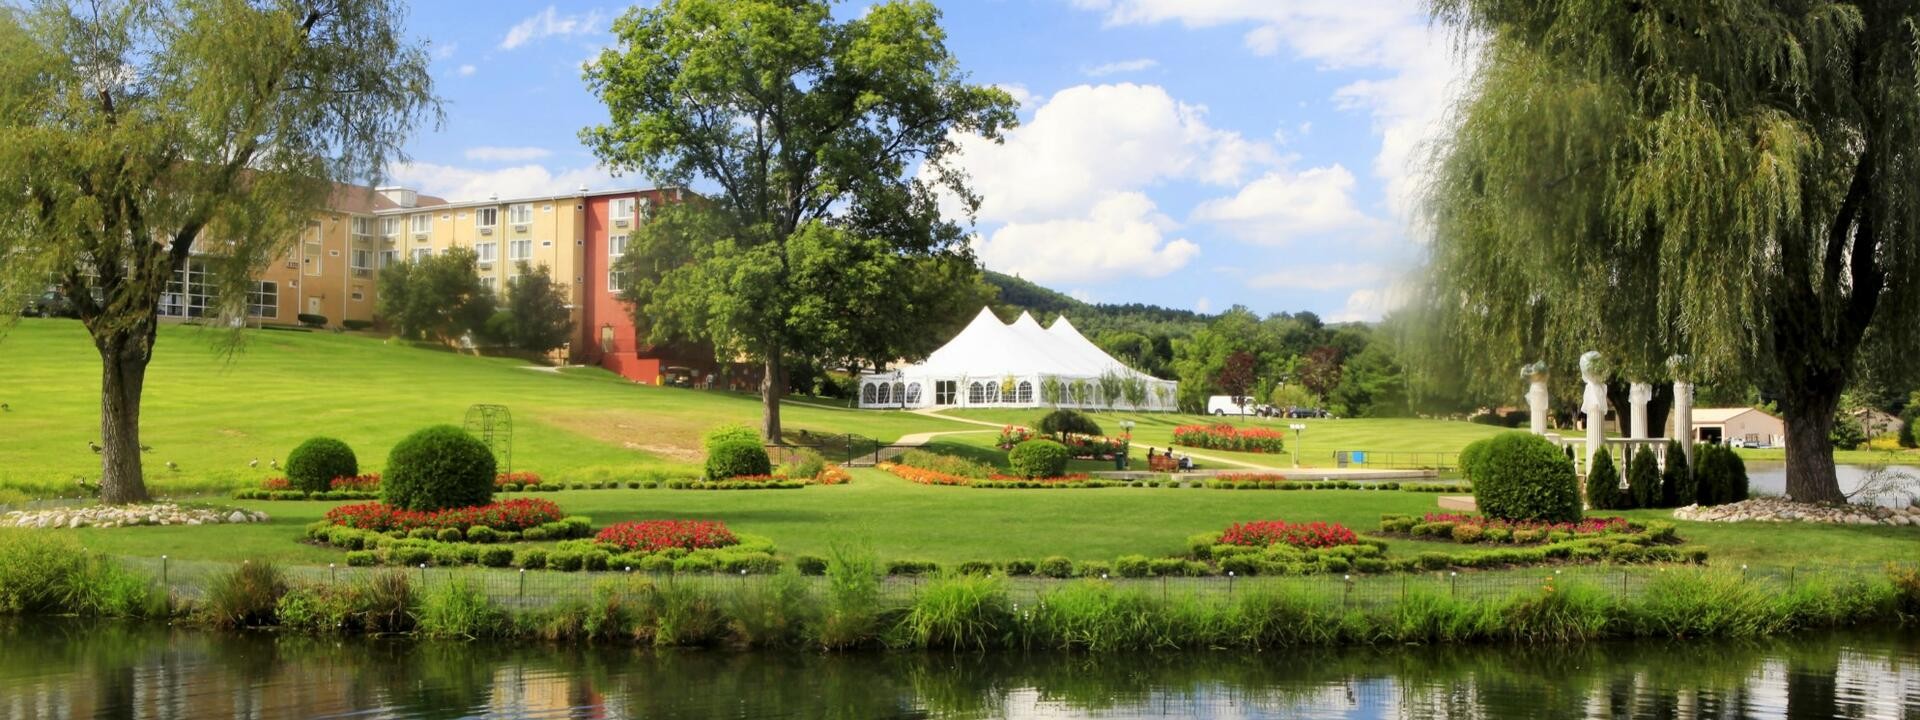 Garden and outdoor wedding venue